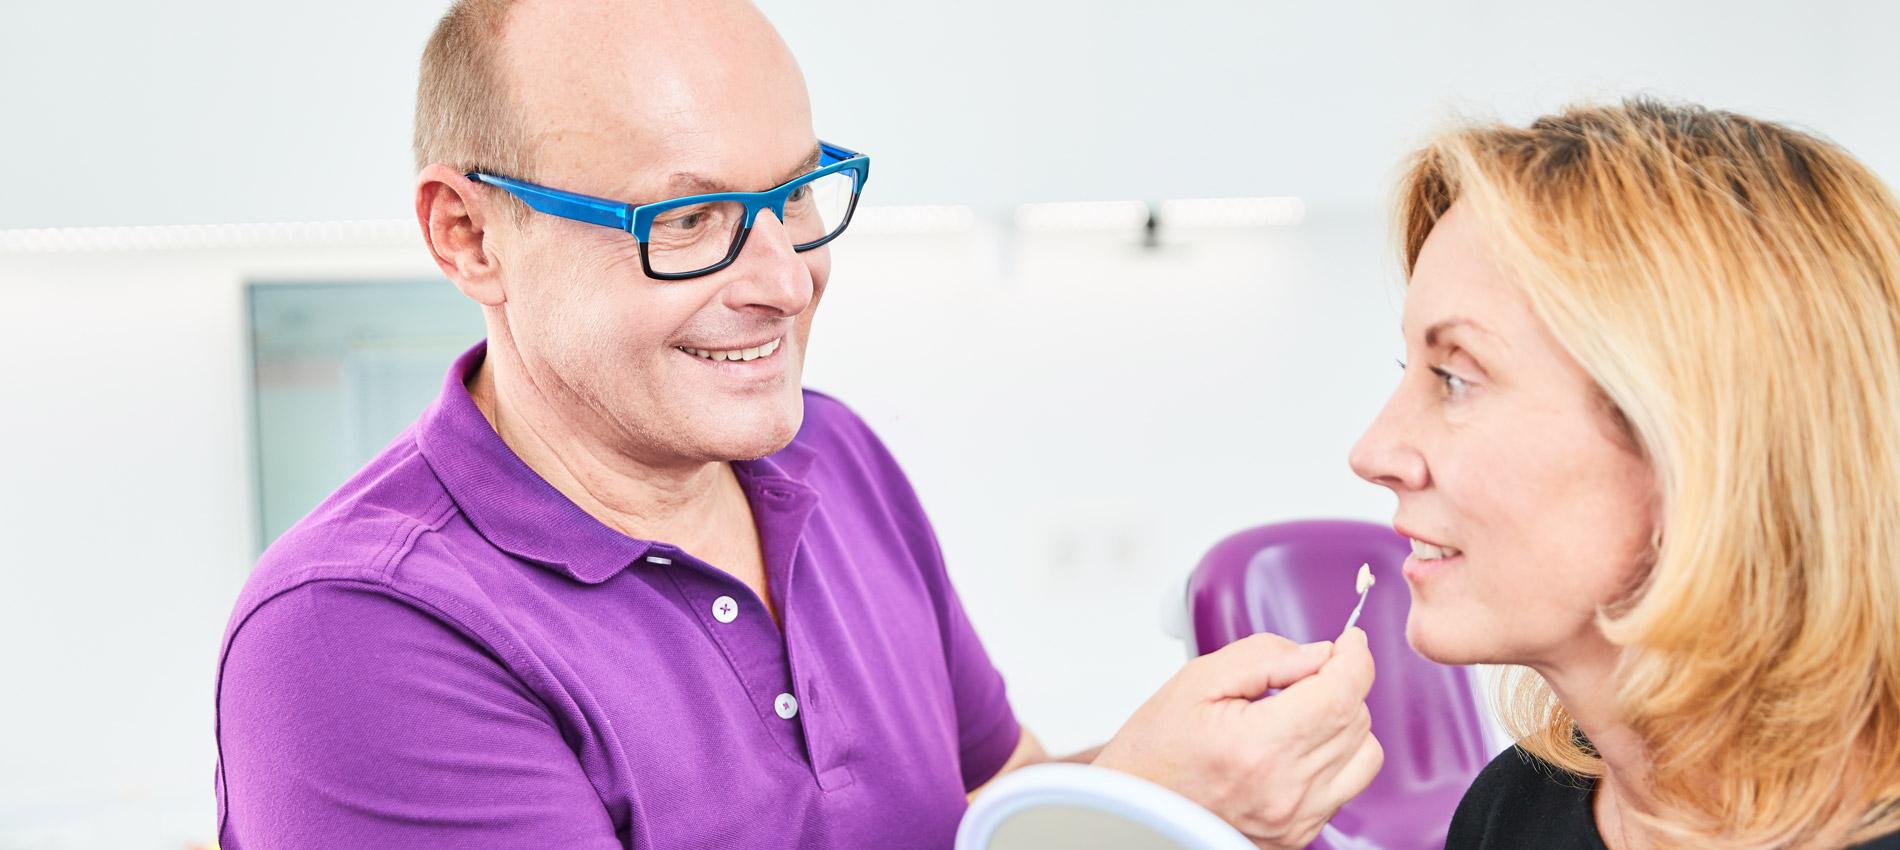 Zahnarztpraxis Ingo Lange - Ästhetische Zahnmedizin 1